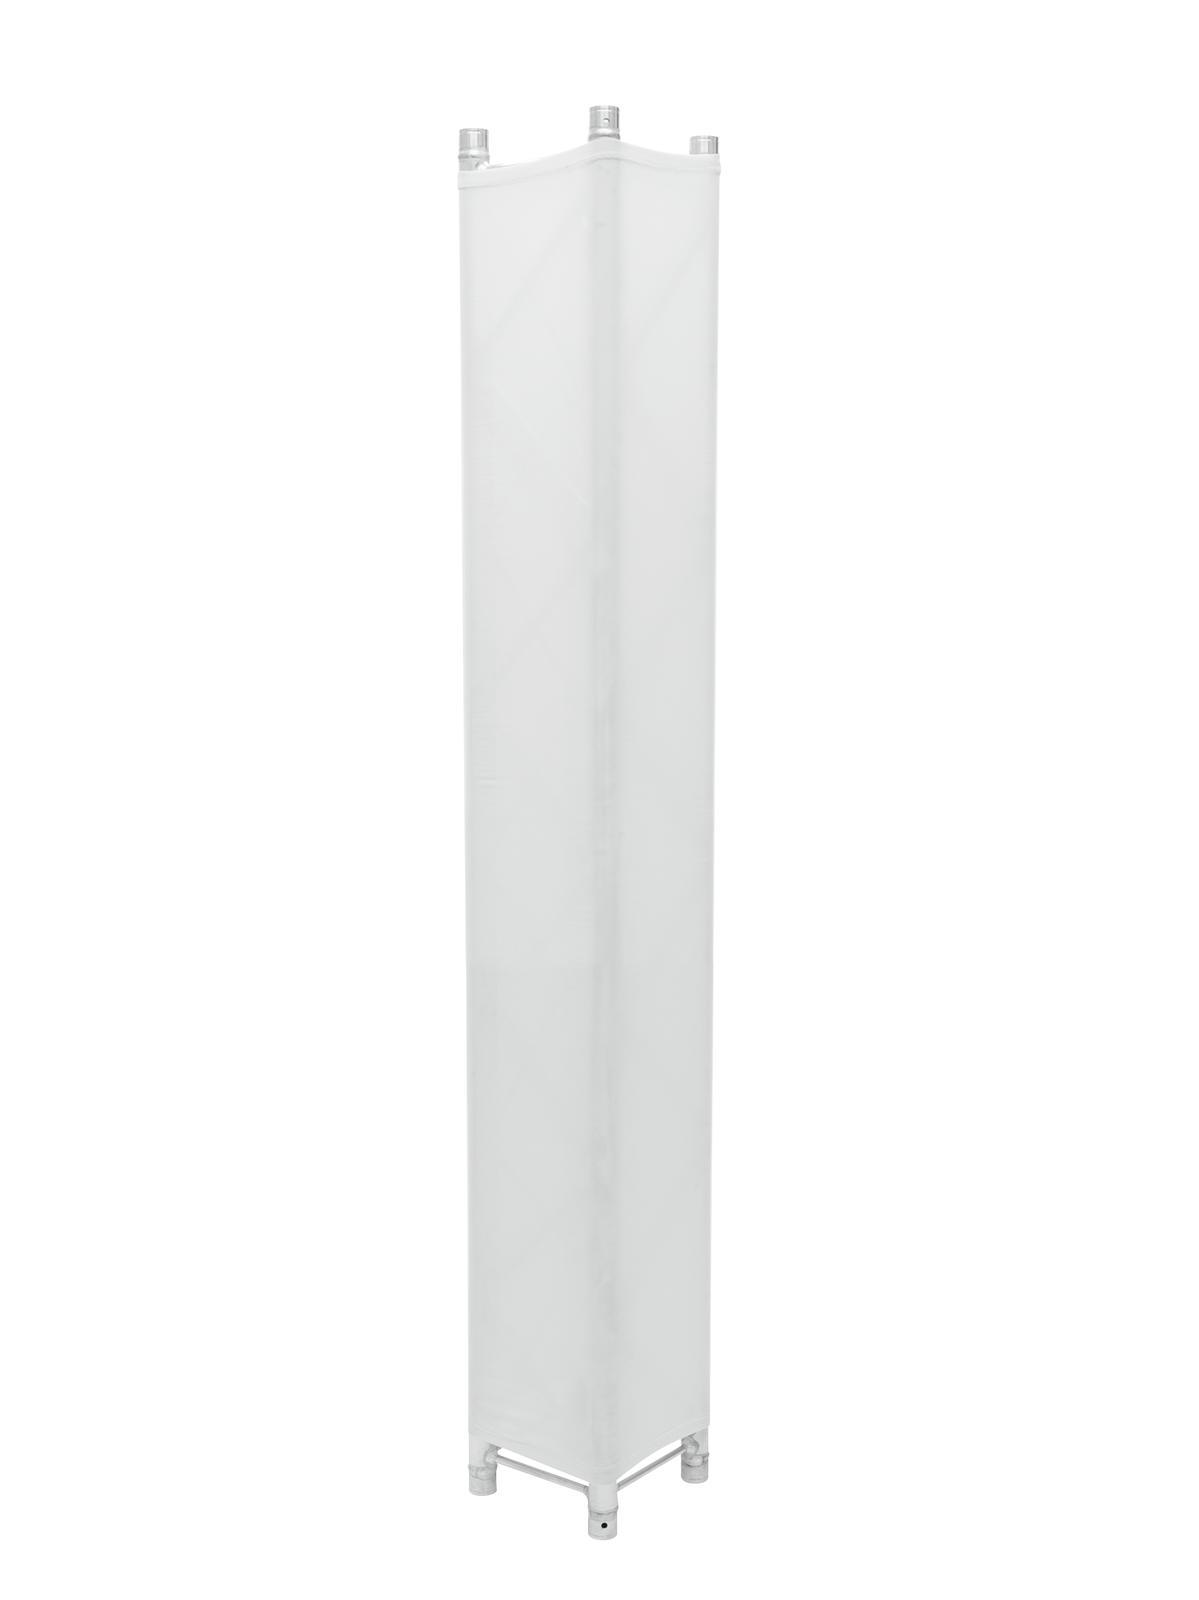 EXPAND Trusscover für Decolock 200cm weiß